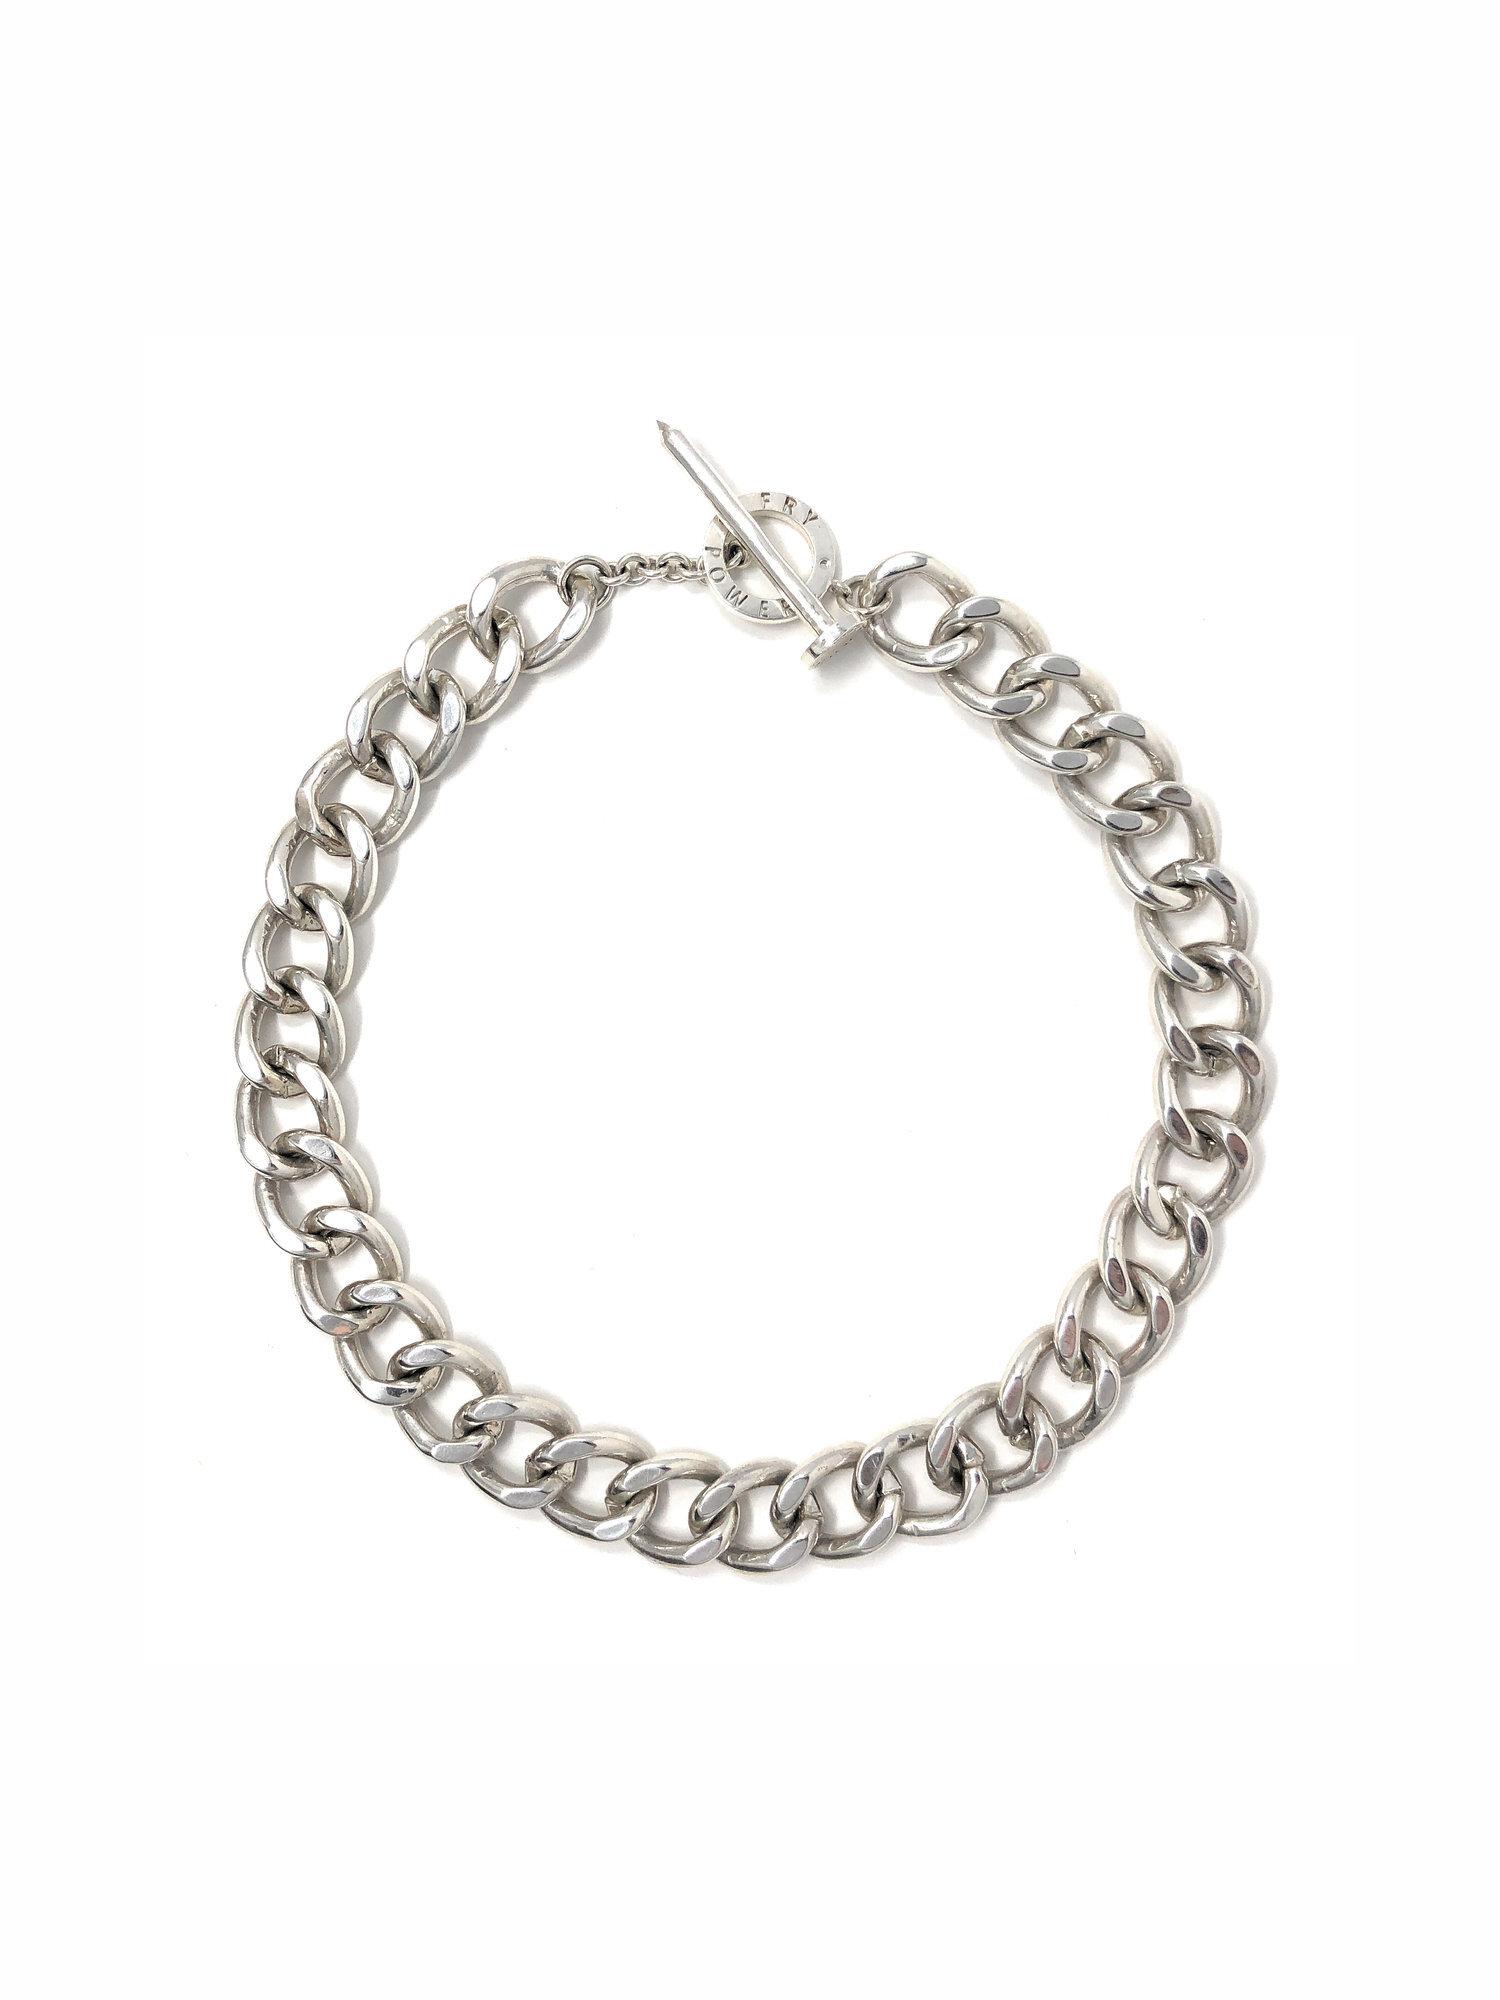 fry-powers-flat-chunky-chain-collar-necklace.jpeg